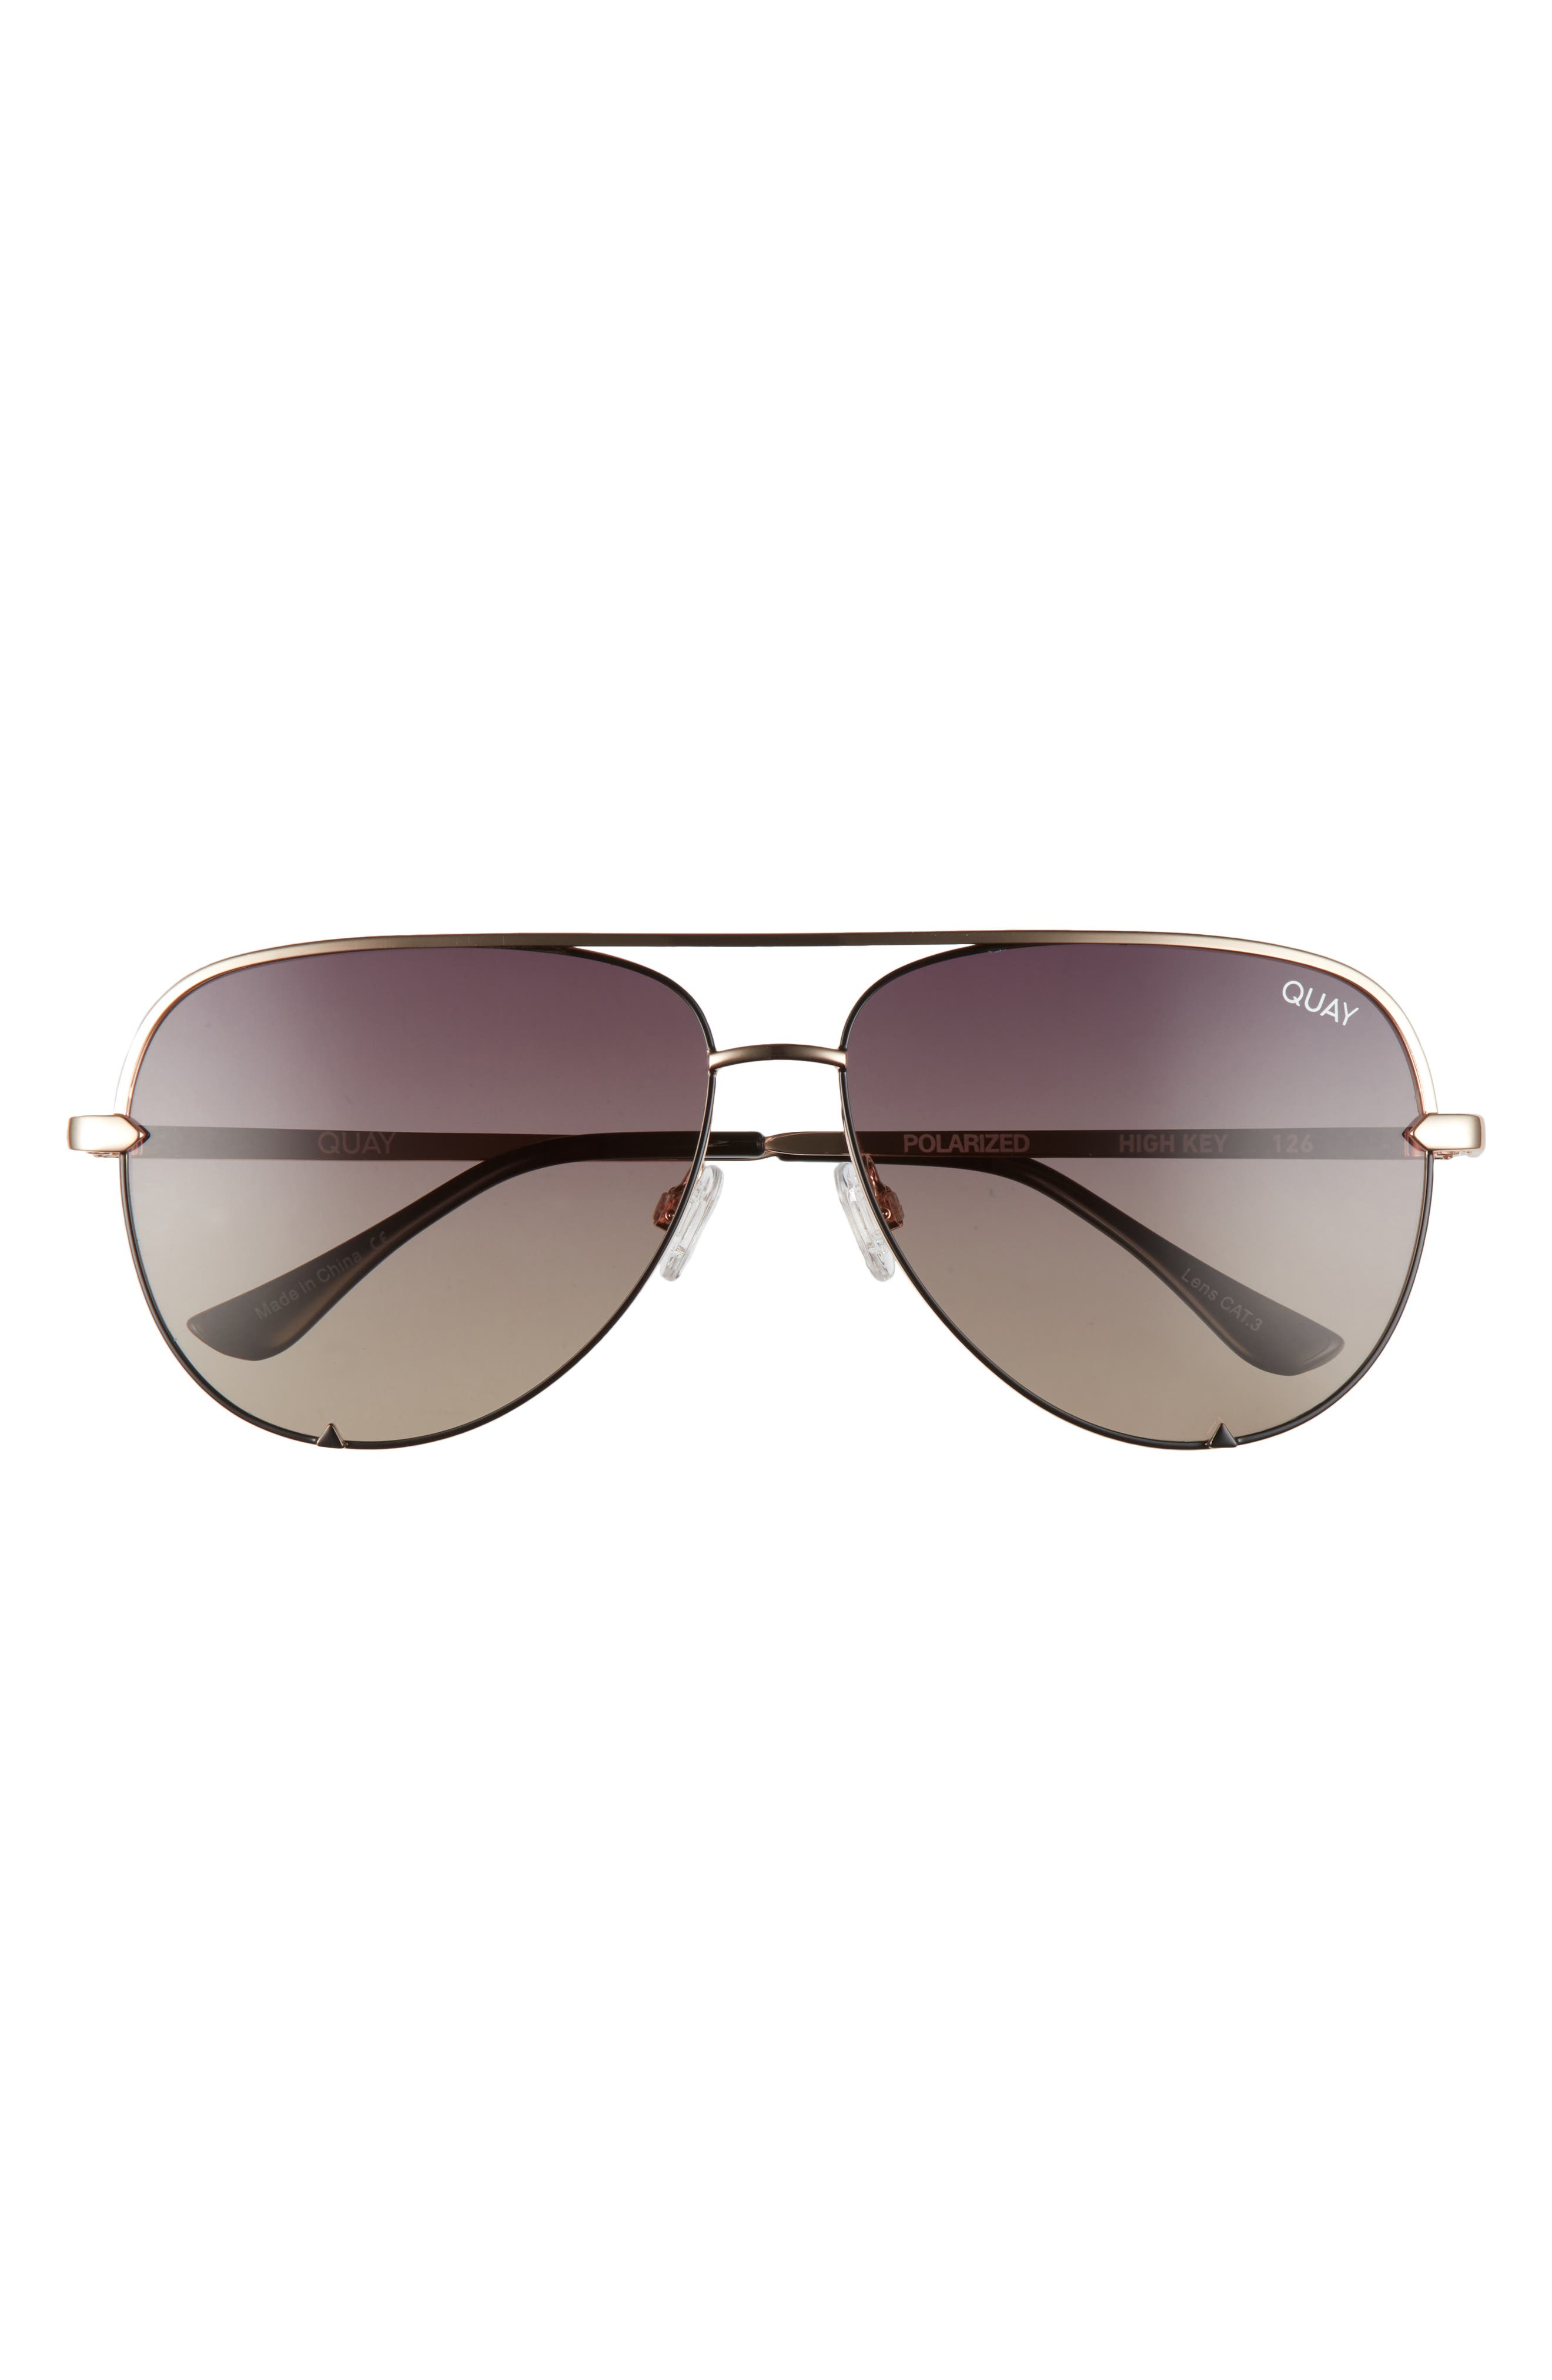 $24 Nordstrom *Vanquish* Clear Sunglasses 100/% UV Protected Black Rims